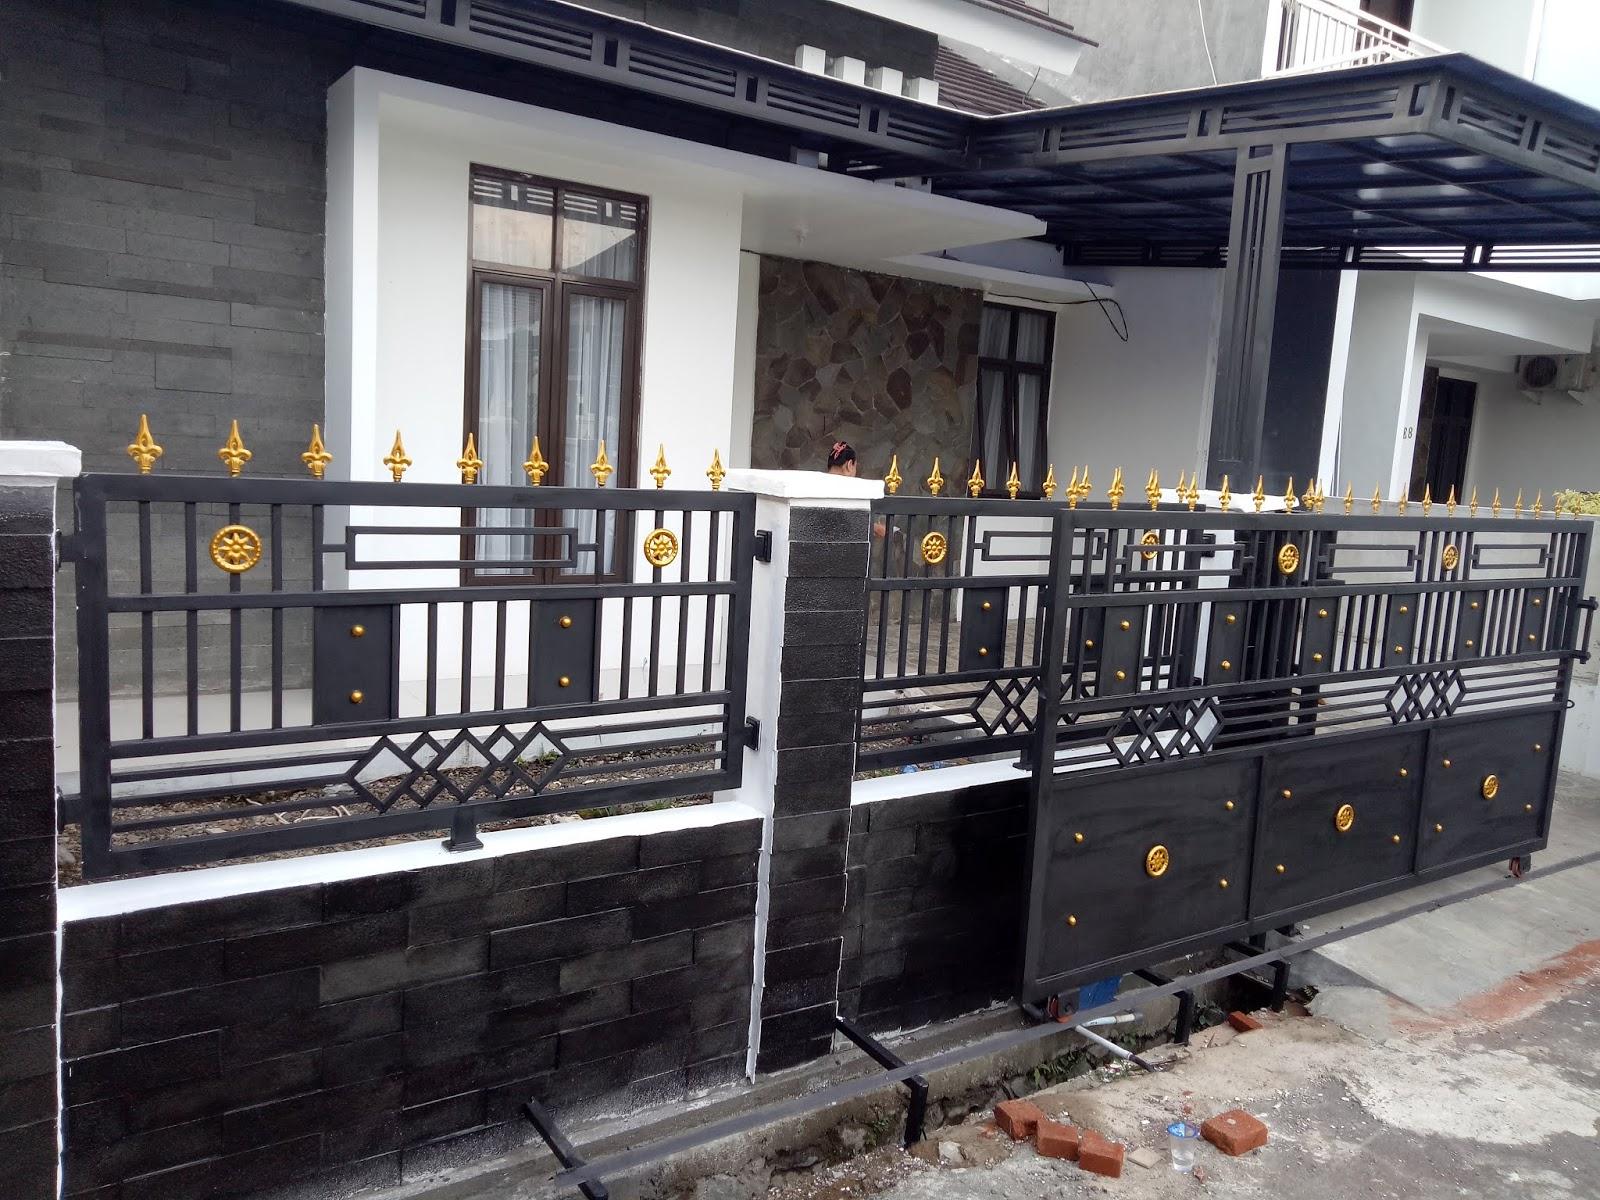 Satu Harga Pagar Minimalis Di Bandung 2020 - BENGKEL LAS BANDUNG